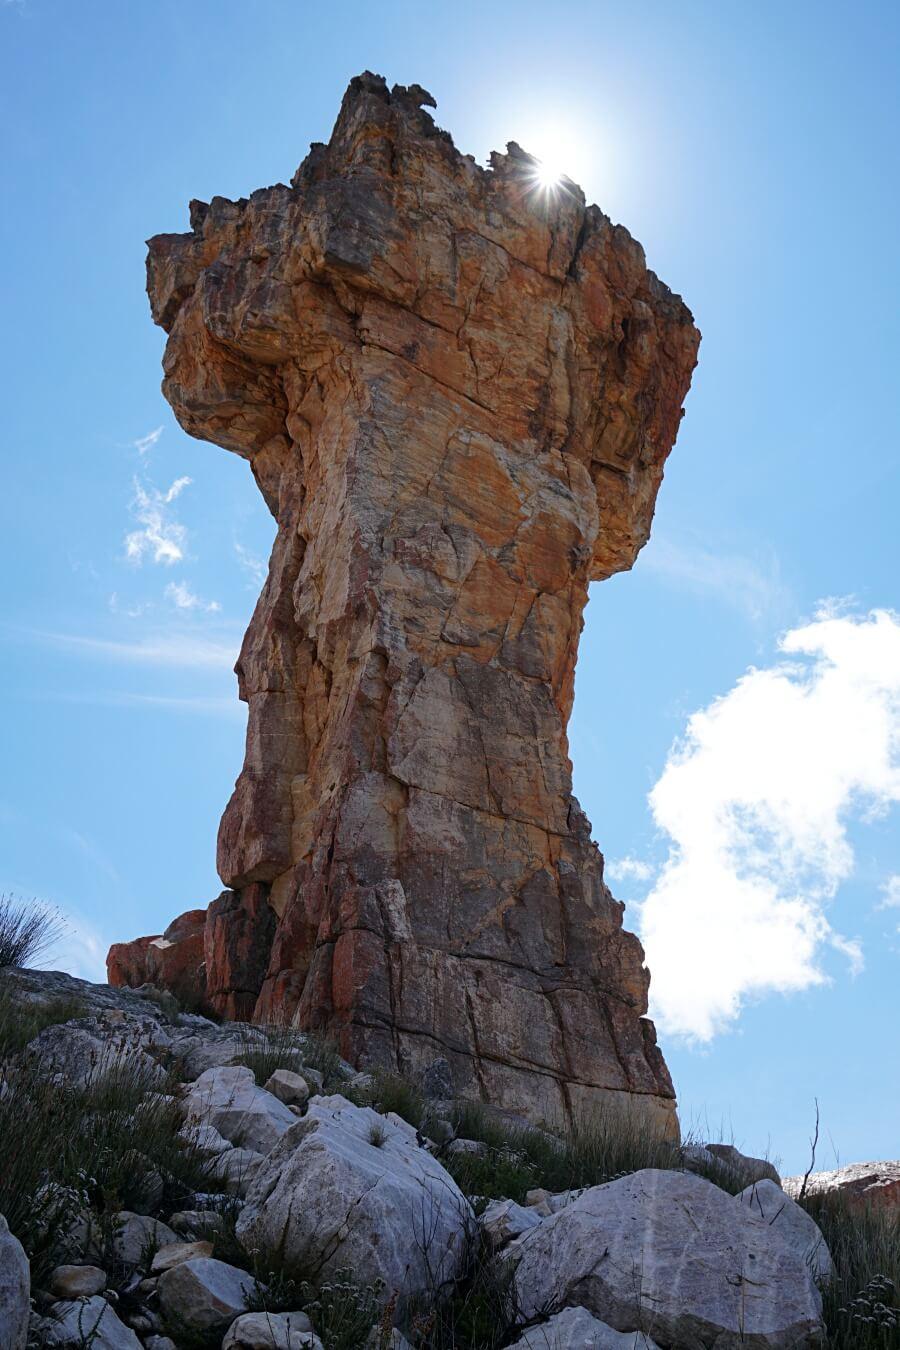 Beeindruckendes Maltese Cross in der Cederberg Wilderness Area